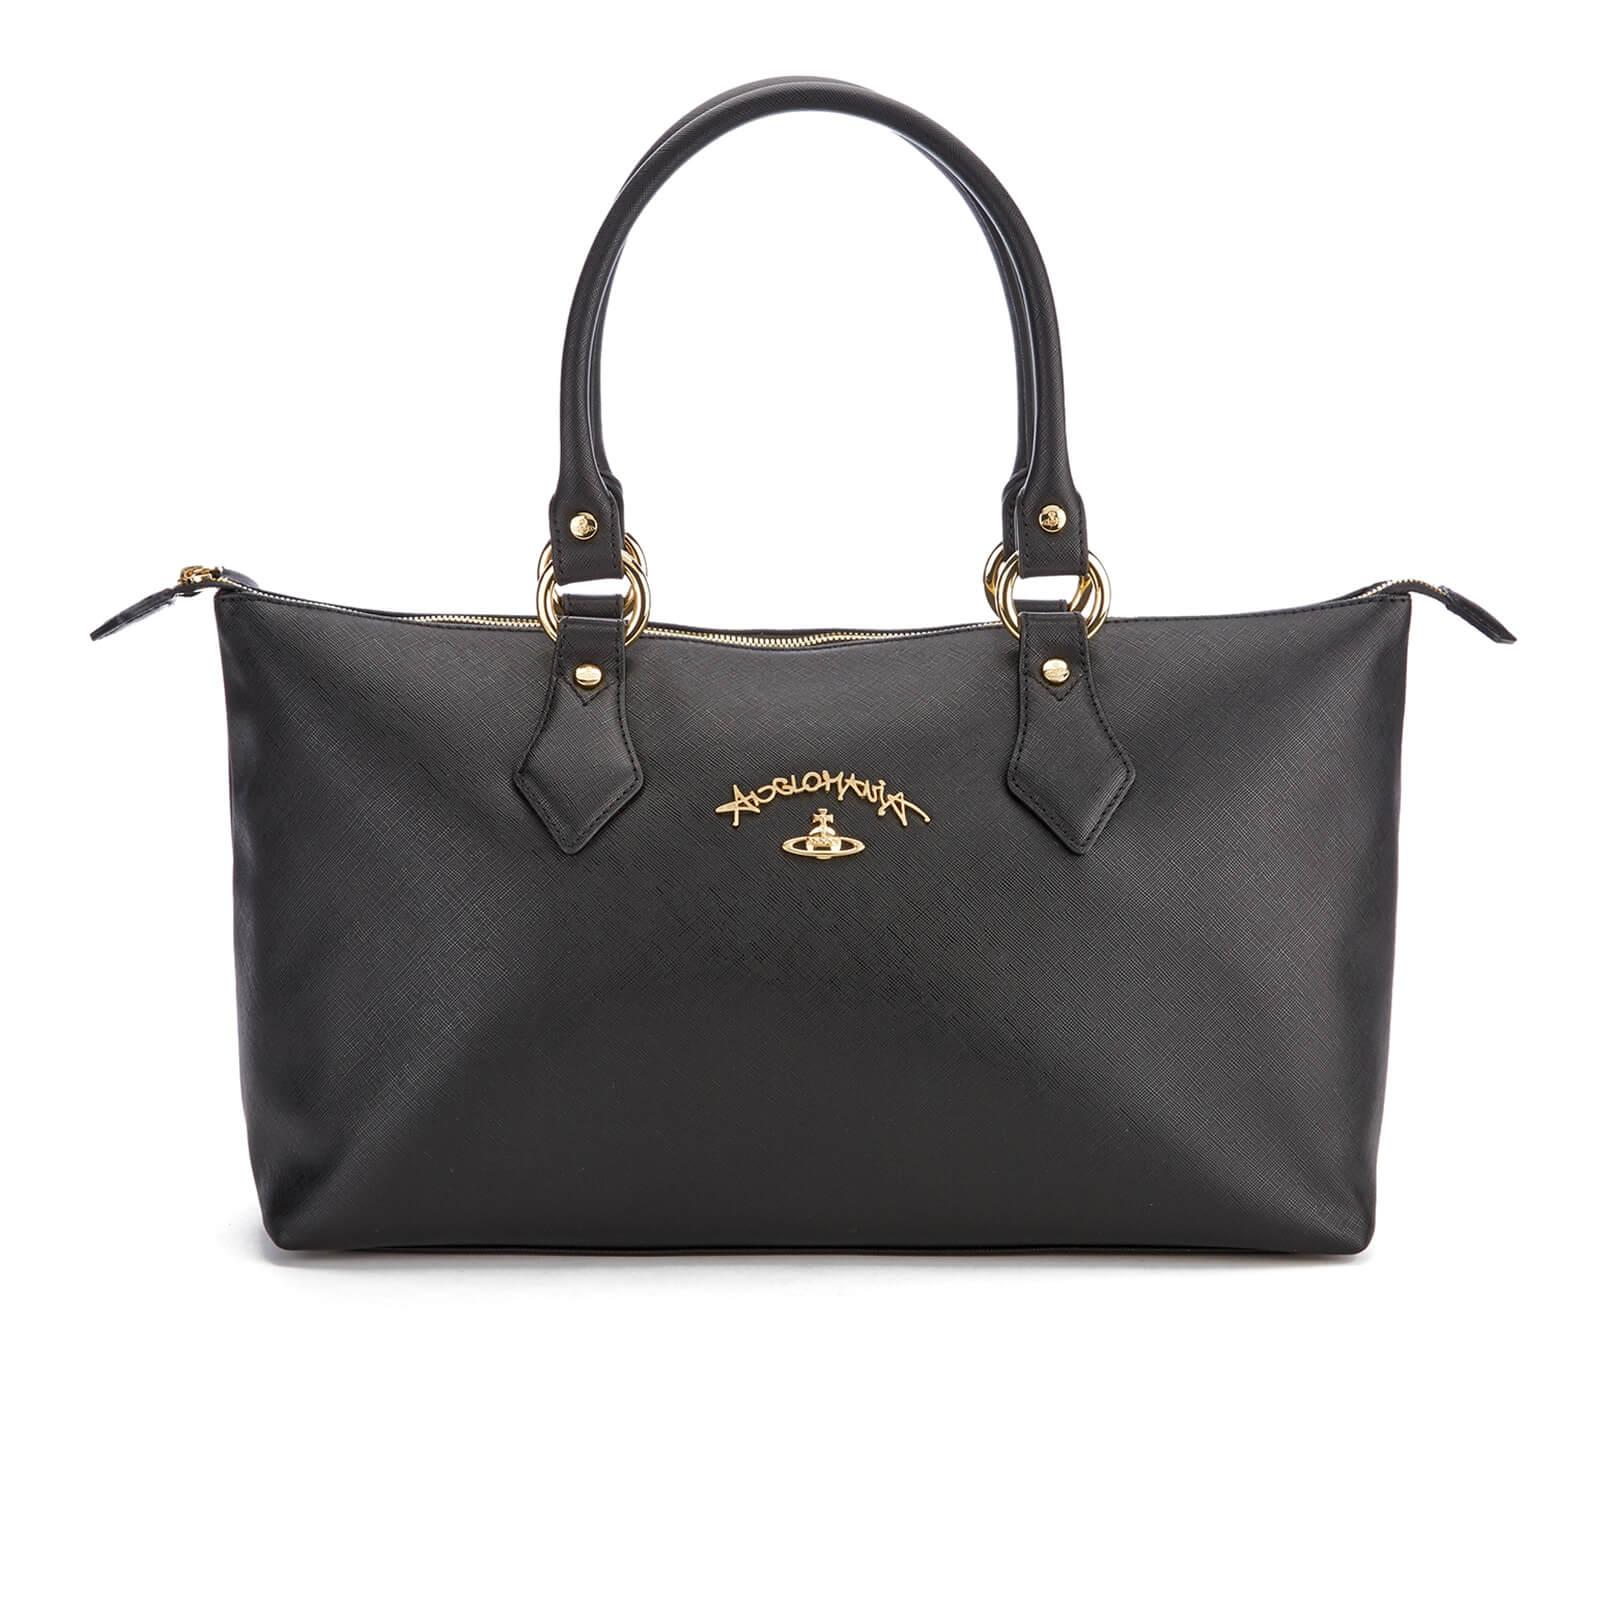 8b0abc5d21 Vivienne Westwood Women's Divina Tote Bag - Black - Free UK Delivery over  £50